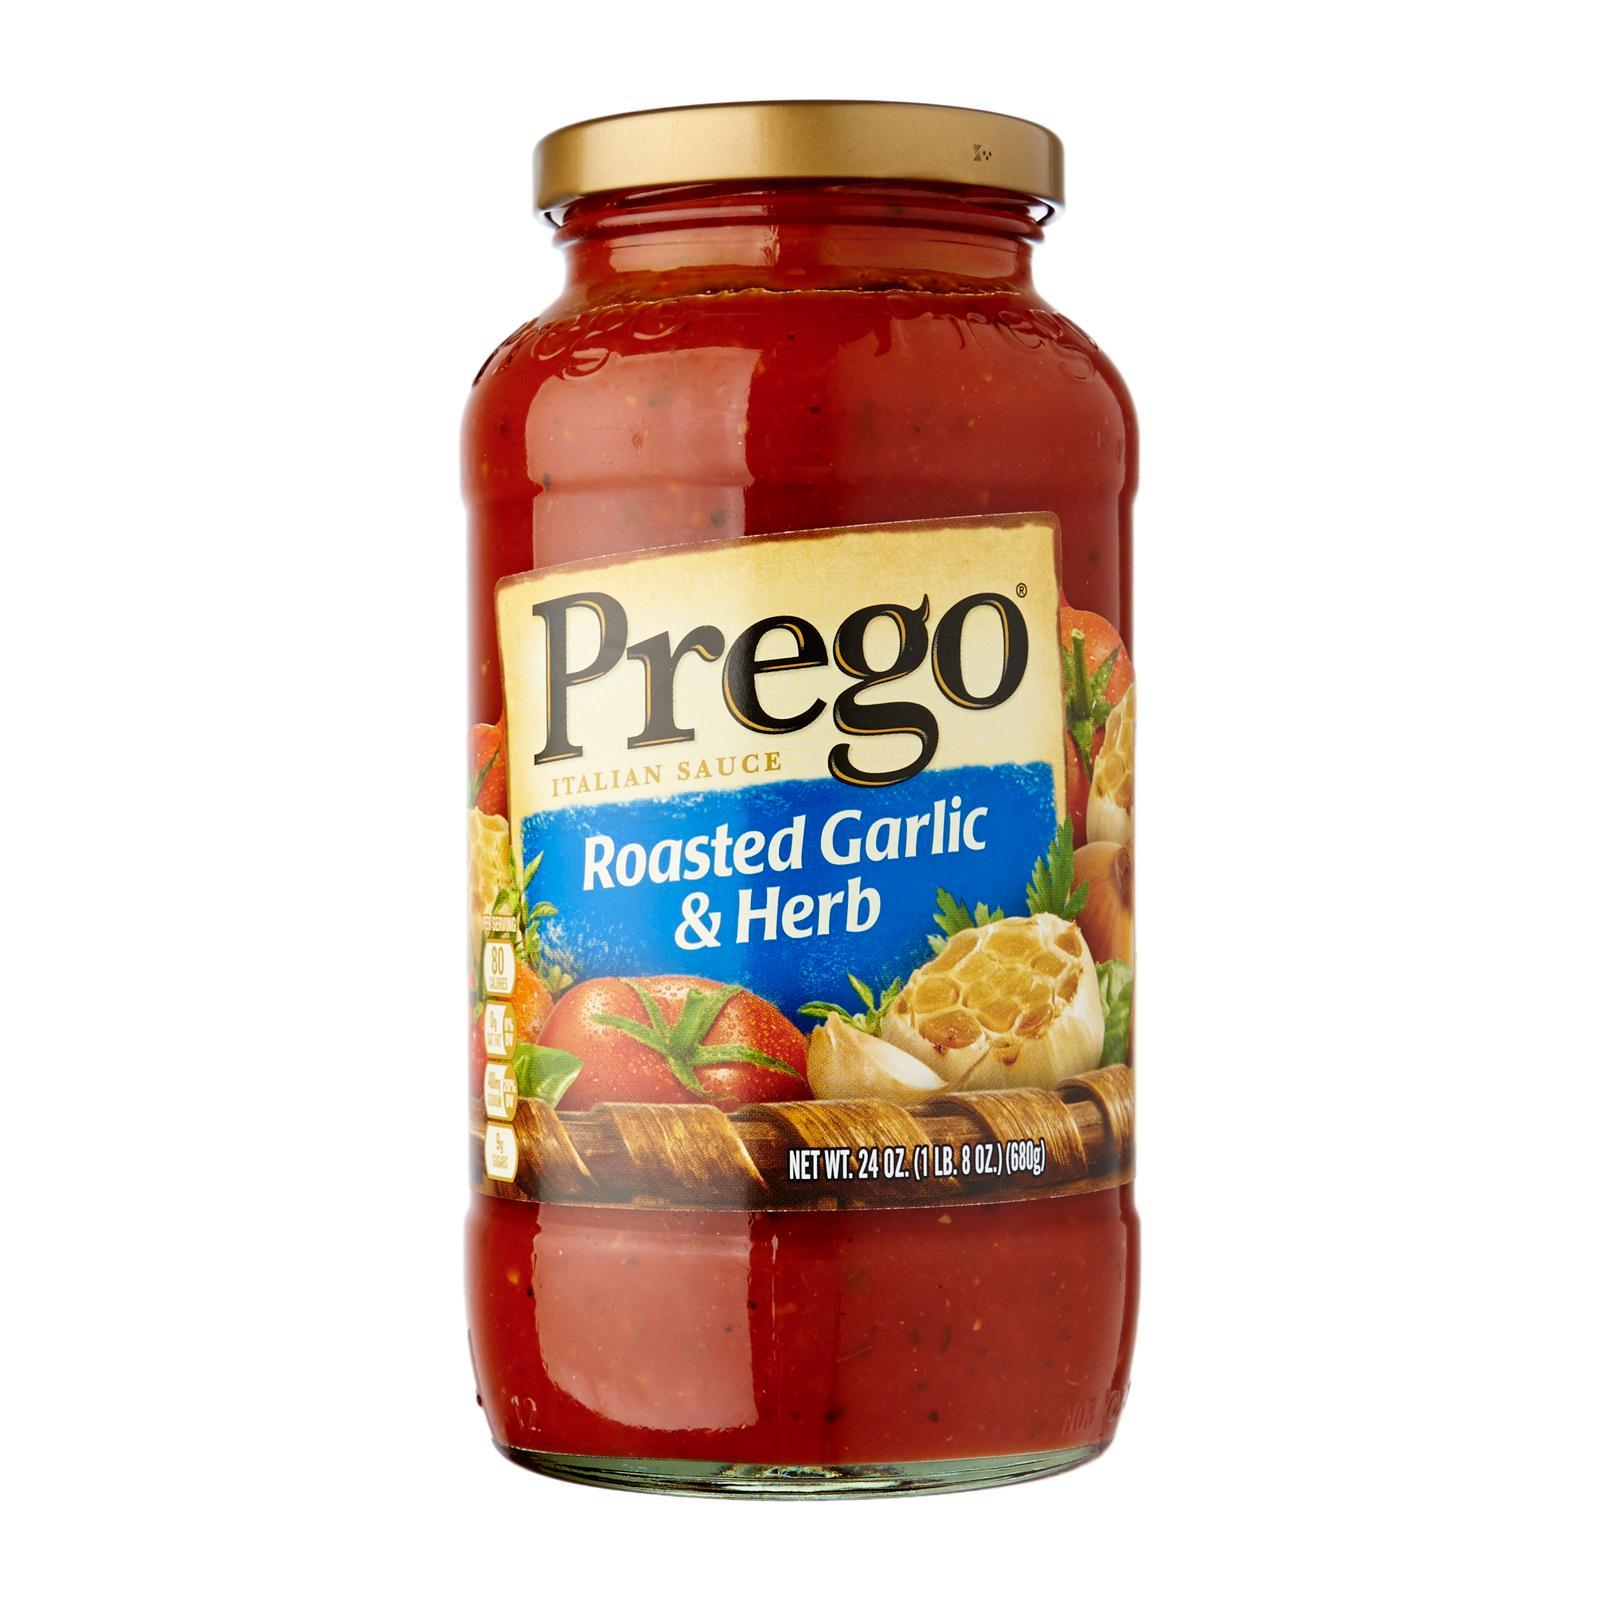 Prego Roasted Garlic Herb Italian Sauce